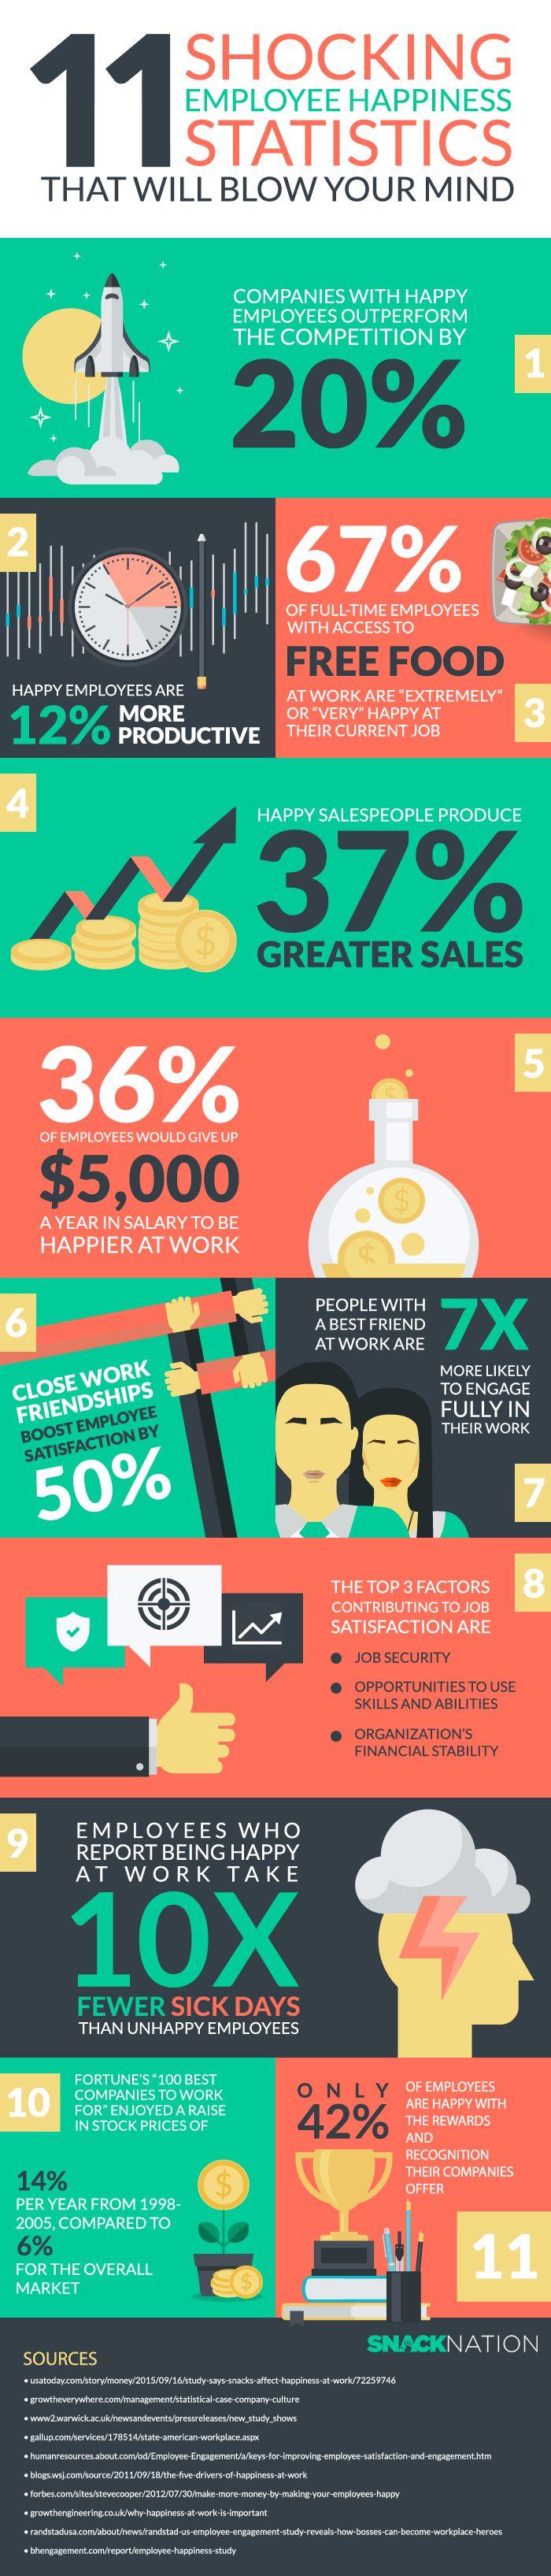 employee happiness infographic